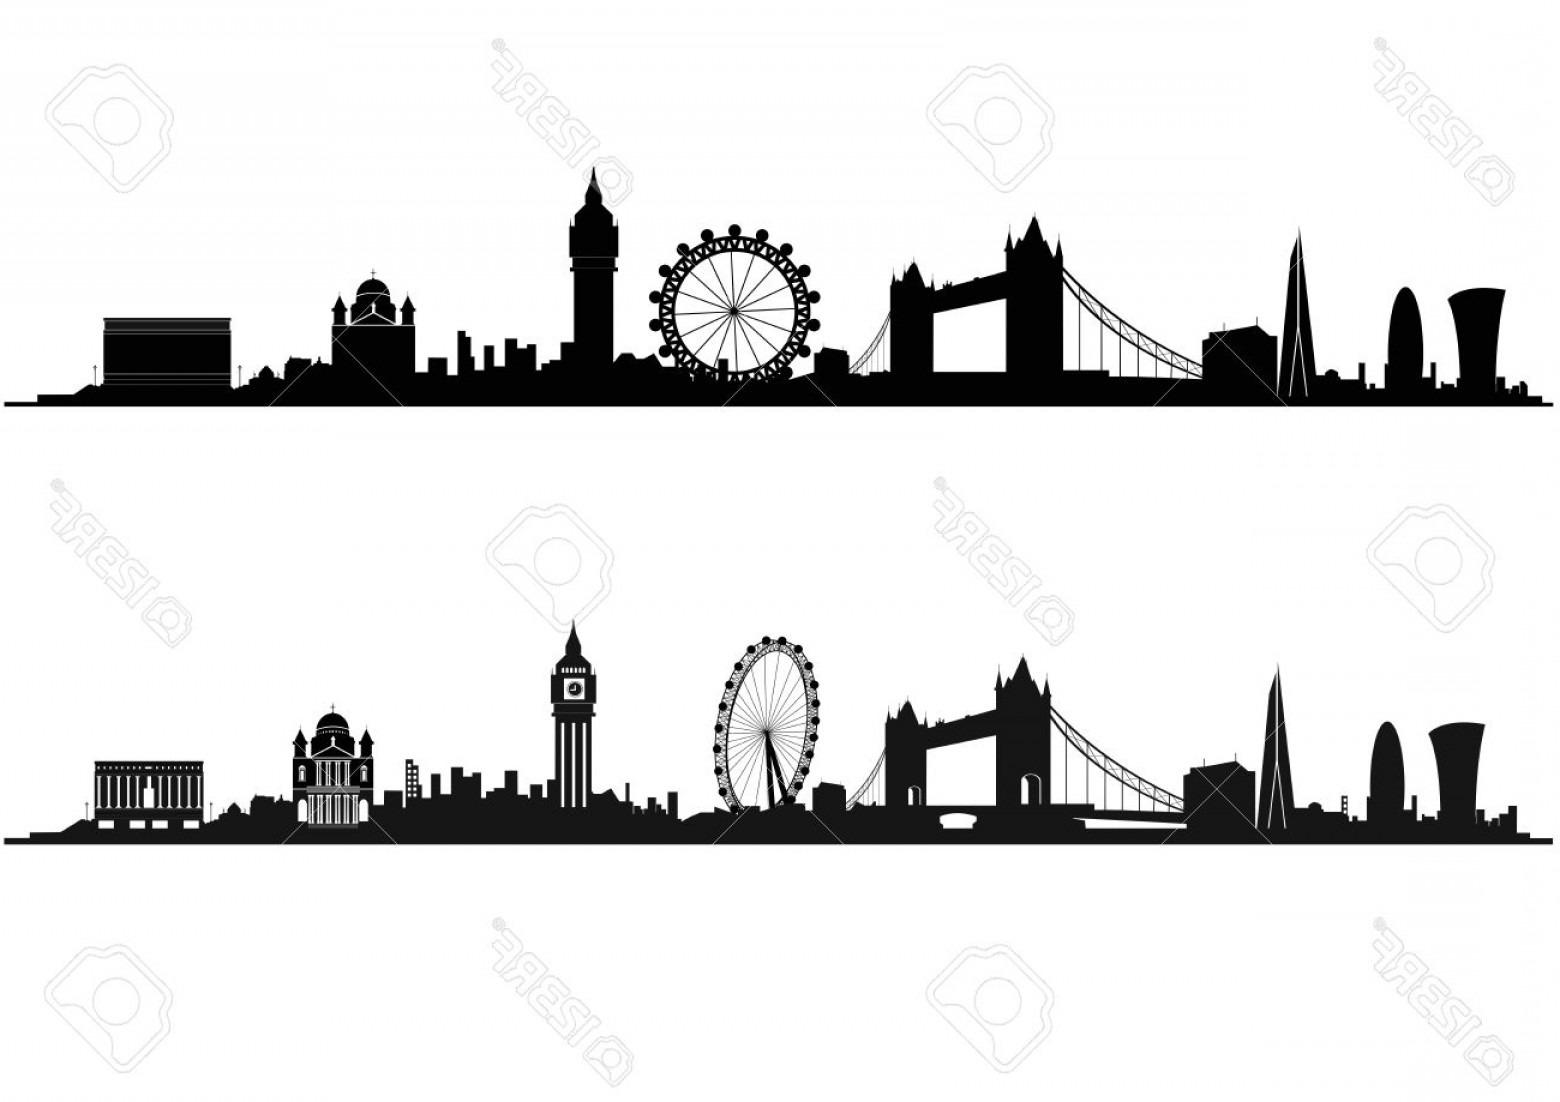 Photostock Vector London Skyline Silhouette In Black And White